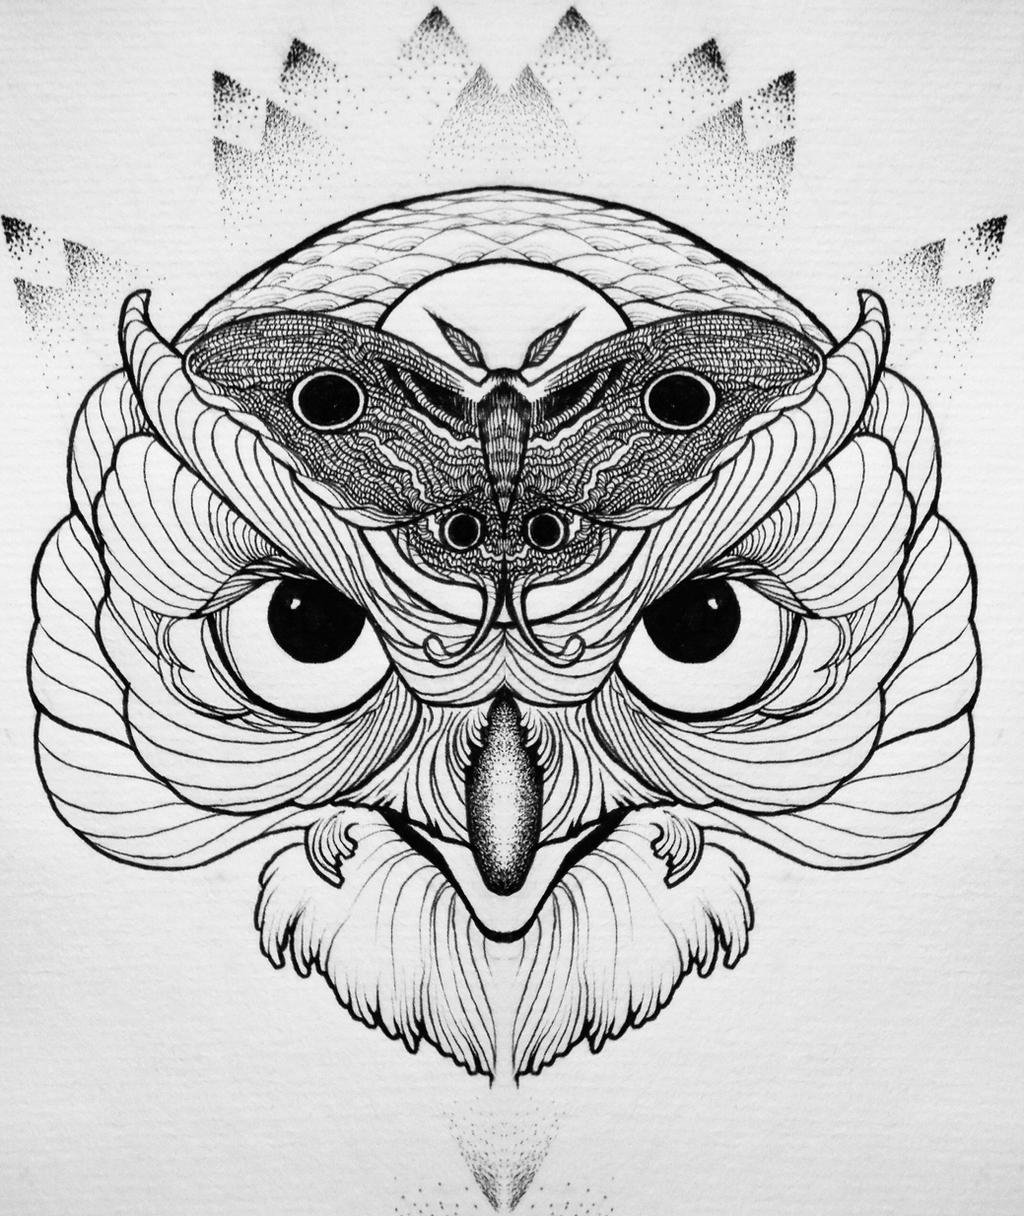 Owl Tattoo Sketch By LookAwake On DeviantArt